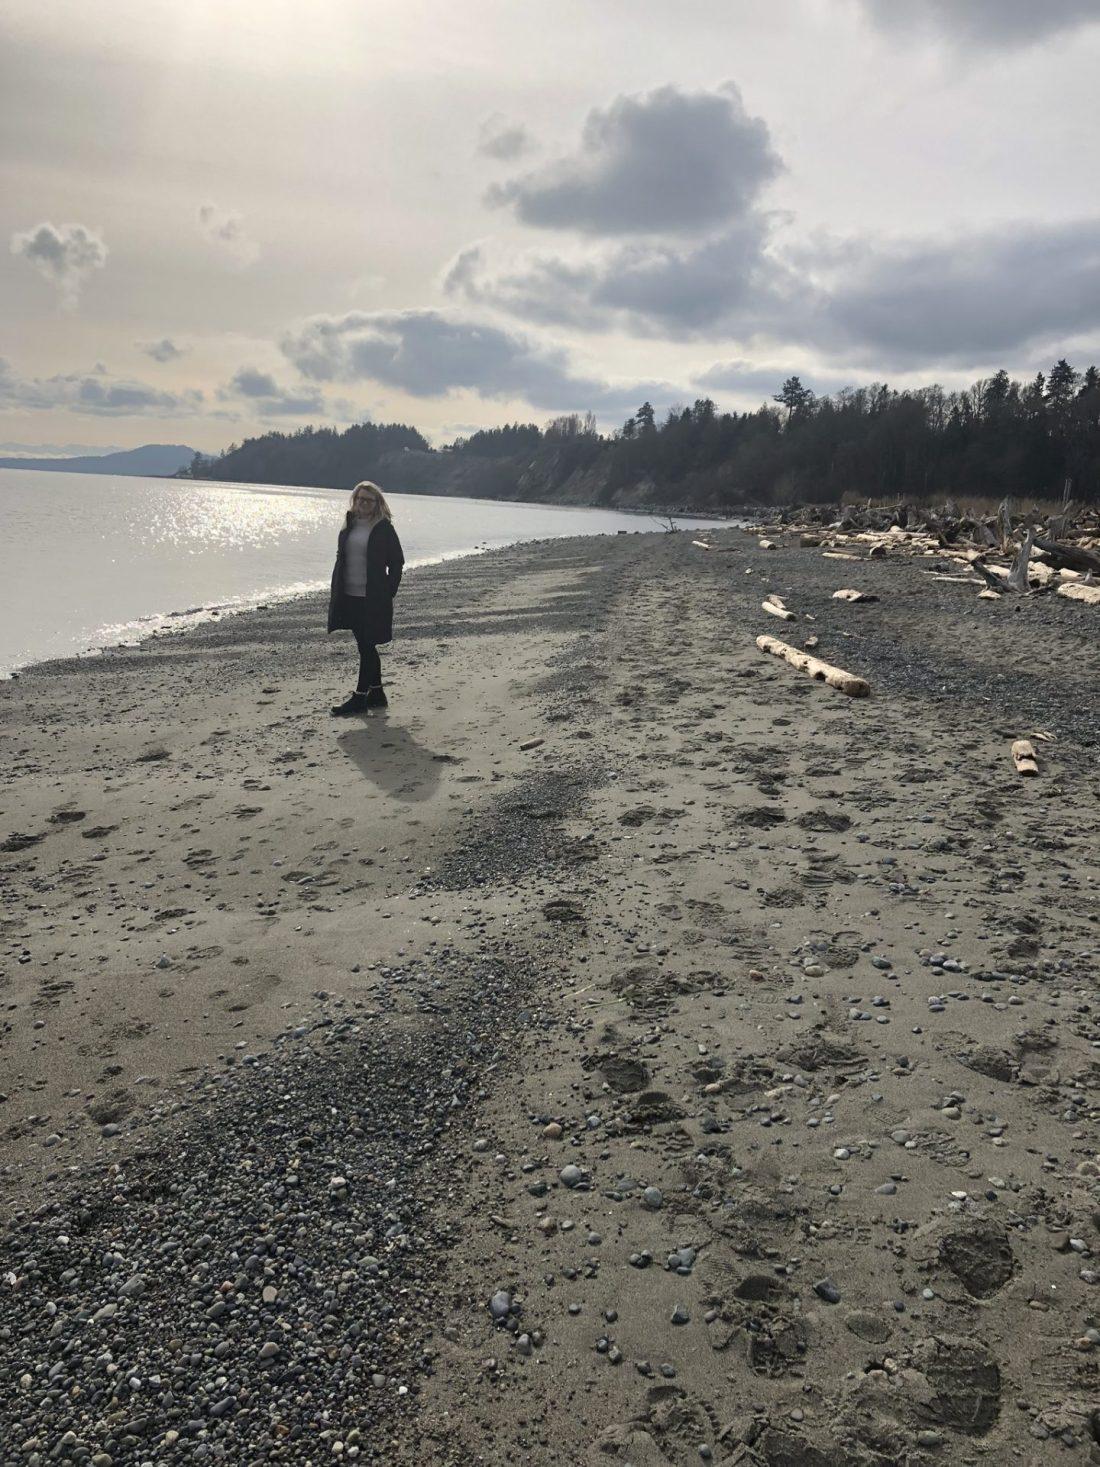 Laura on Island View Beach, Vancouver Island